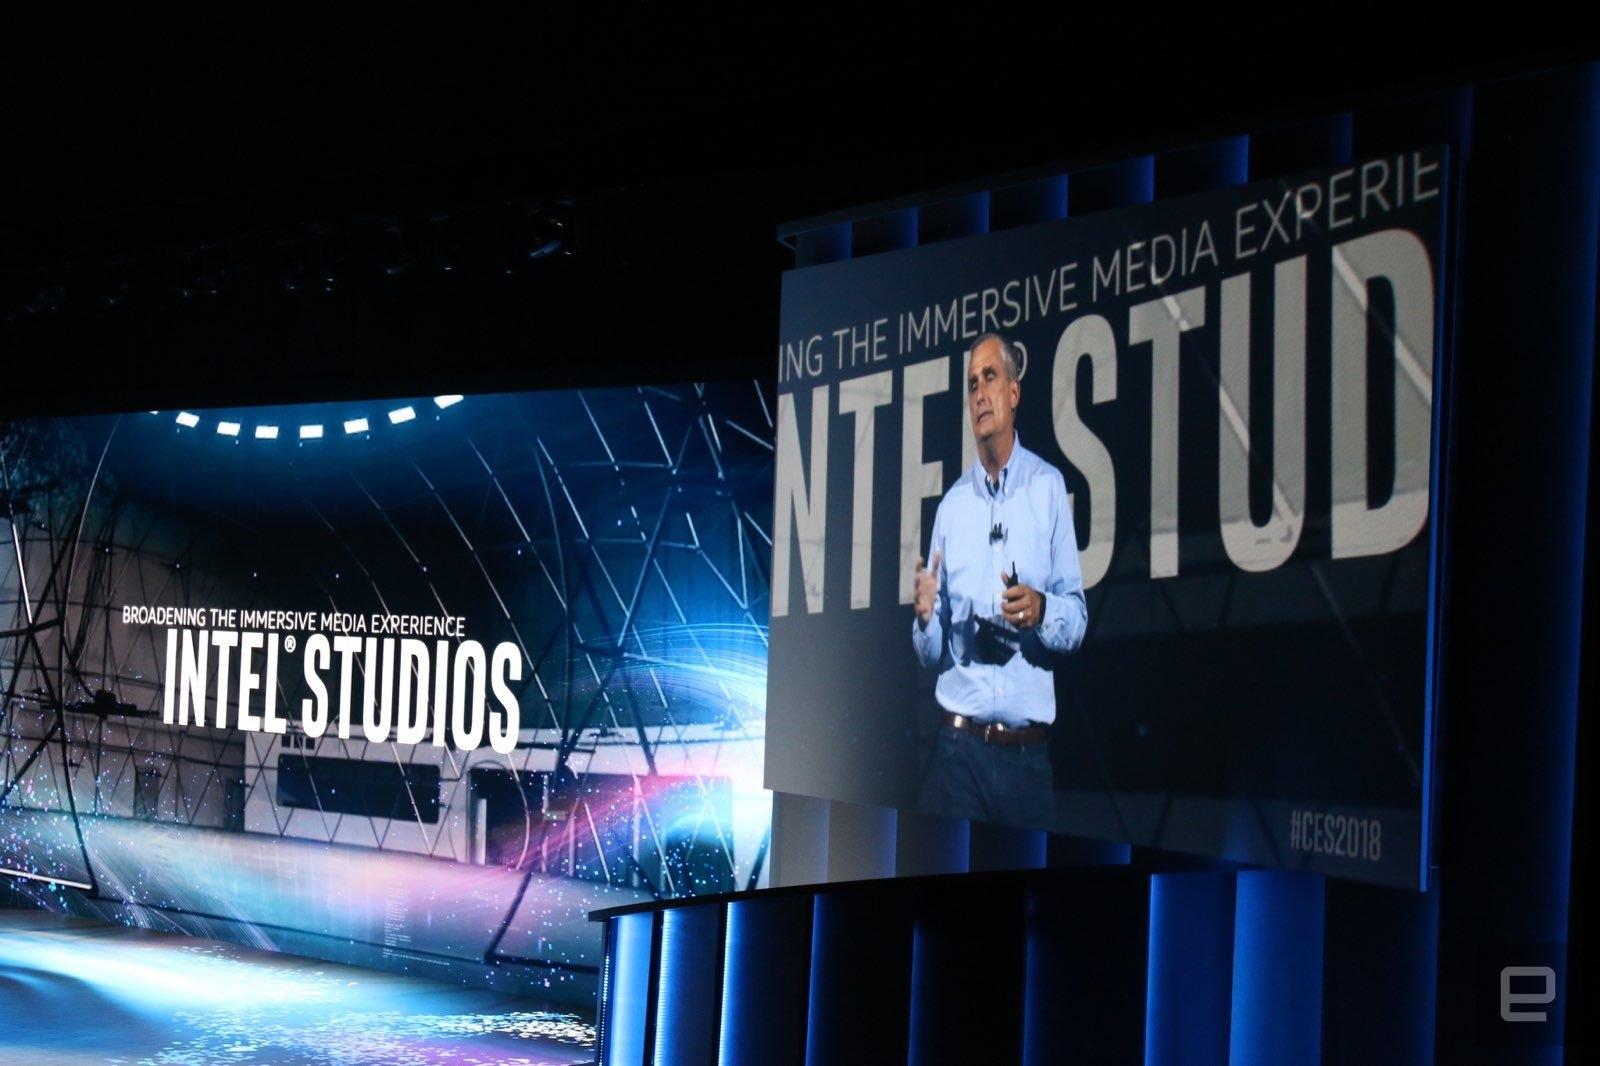 Intel Studios工作室成立,专注容积式视频和动作捕捉